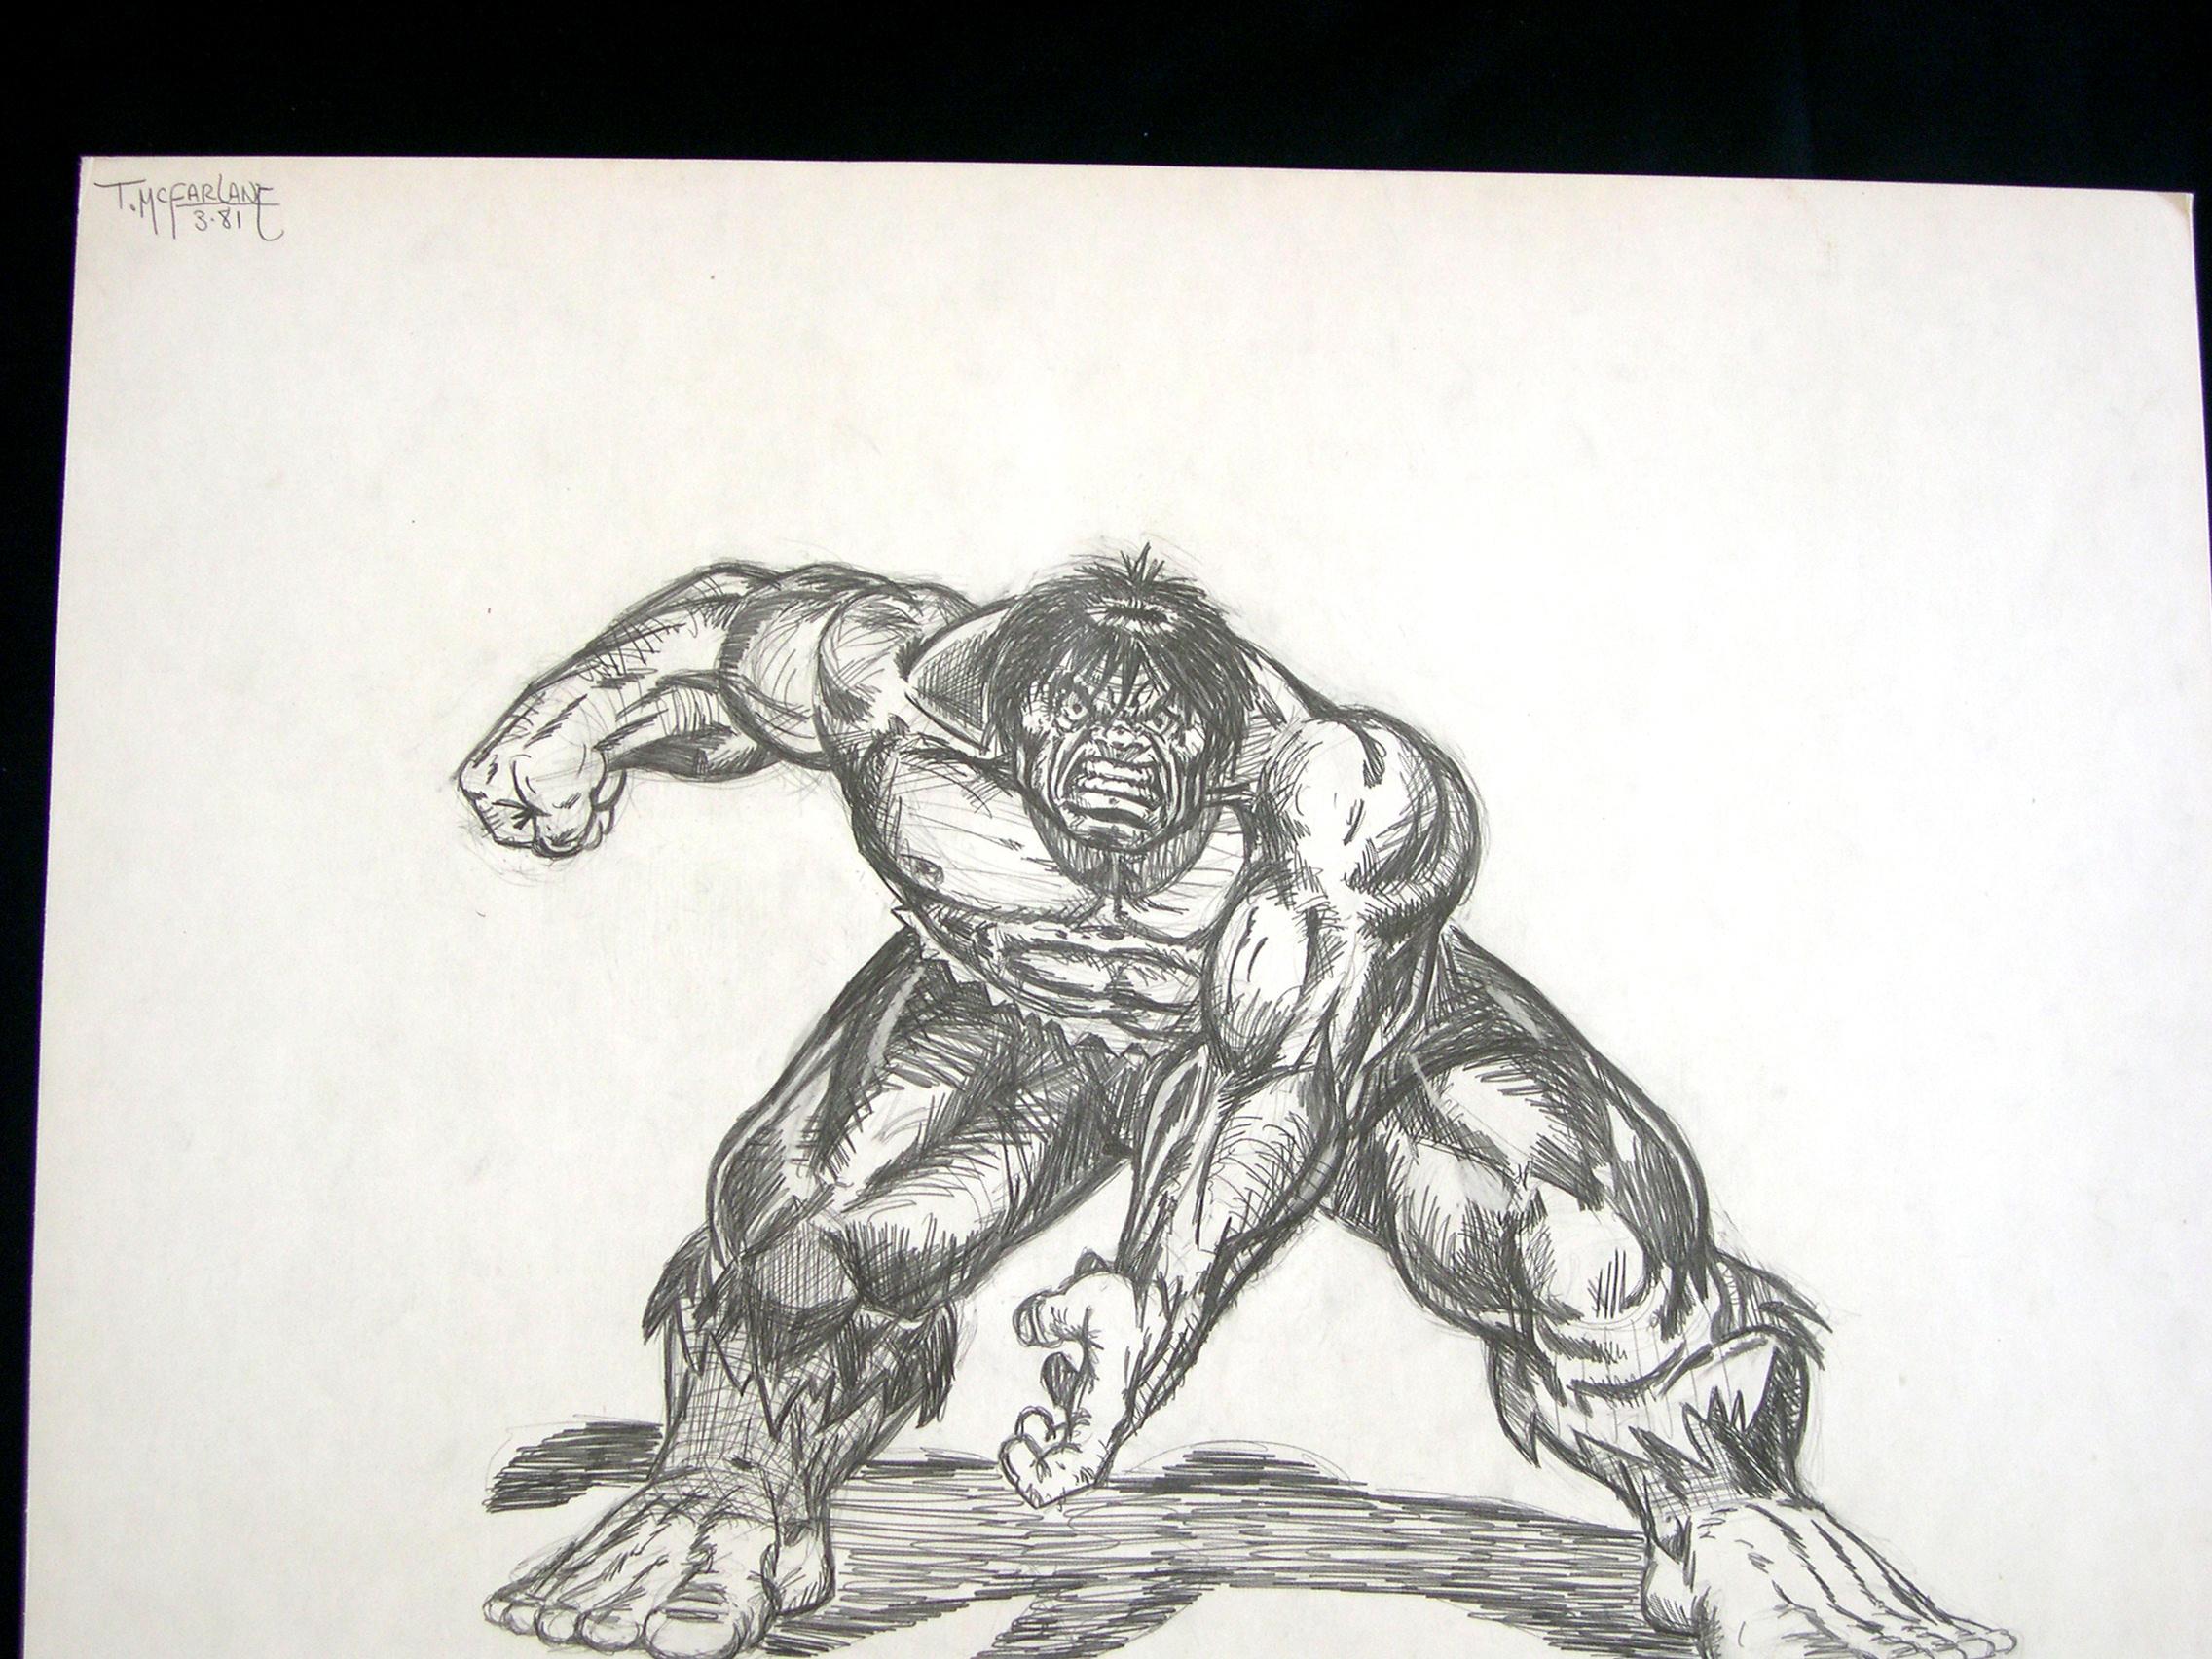 Hulk_early_sketch_1